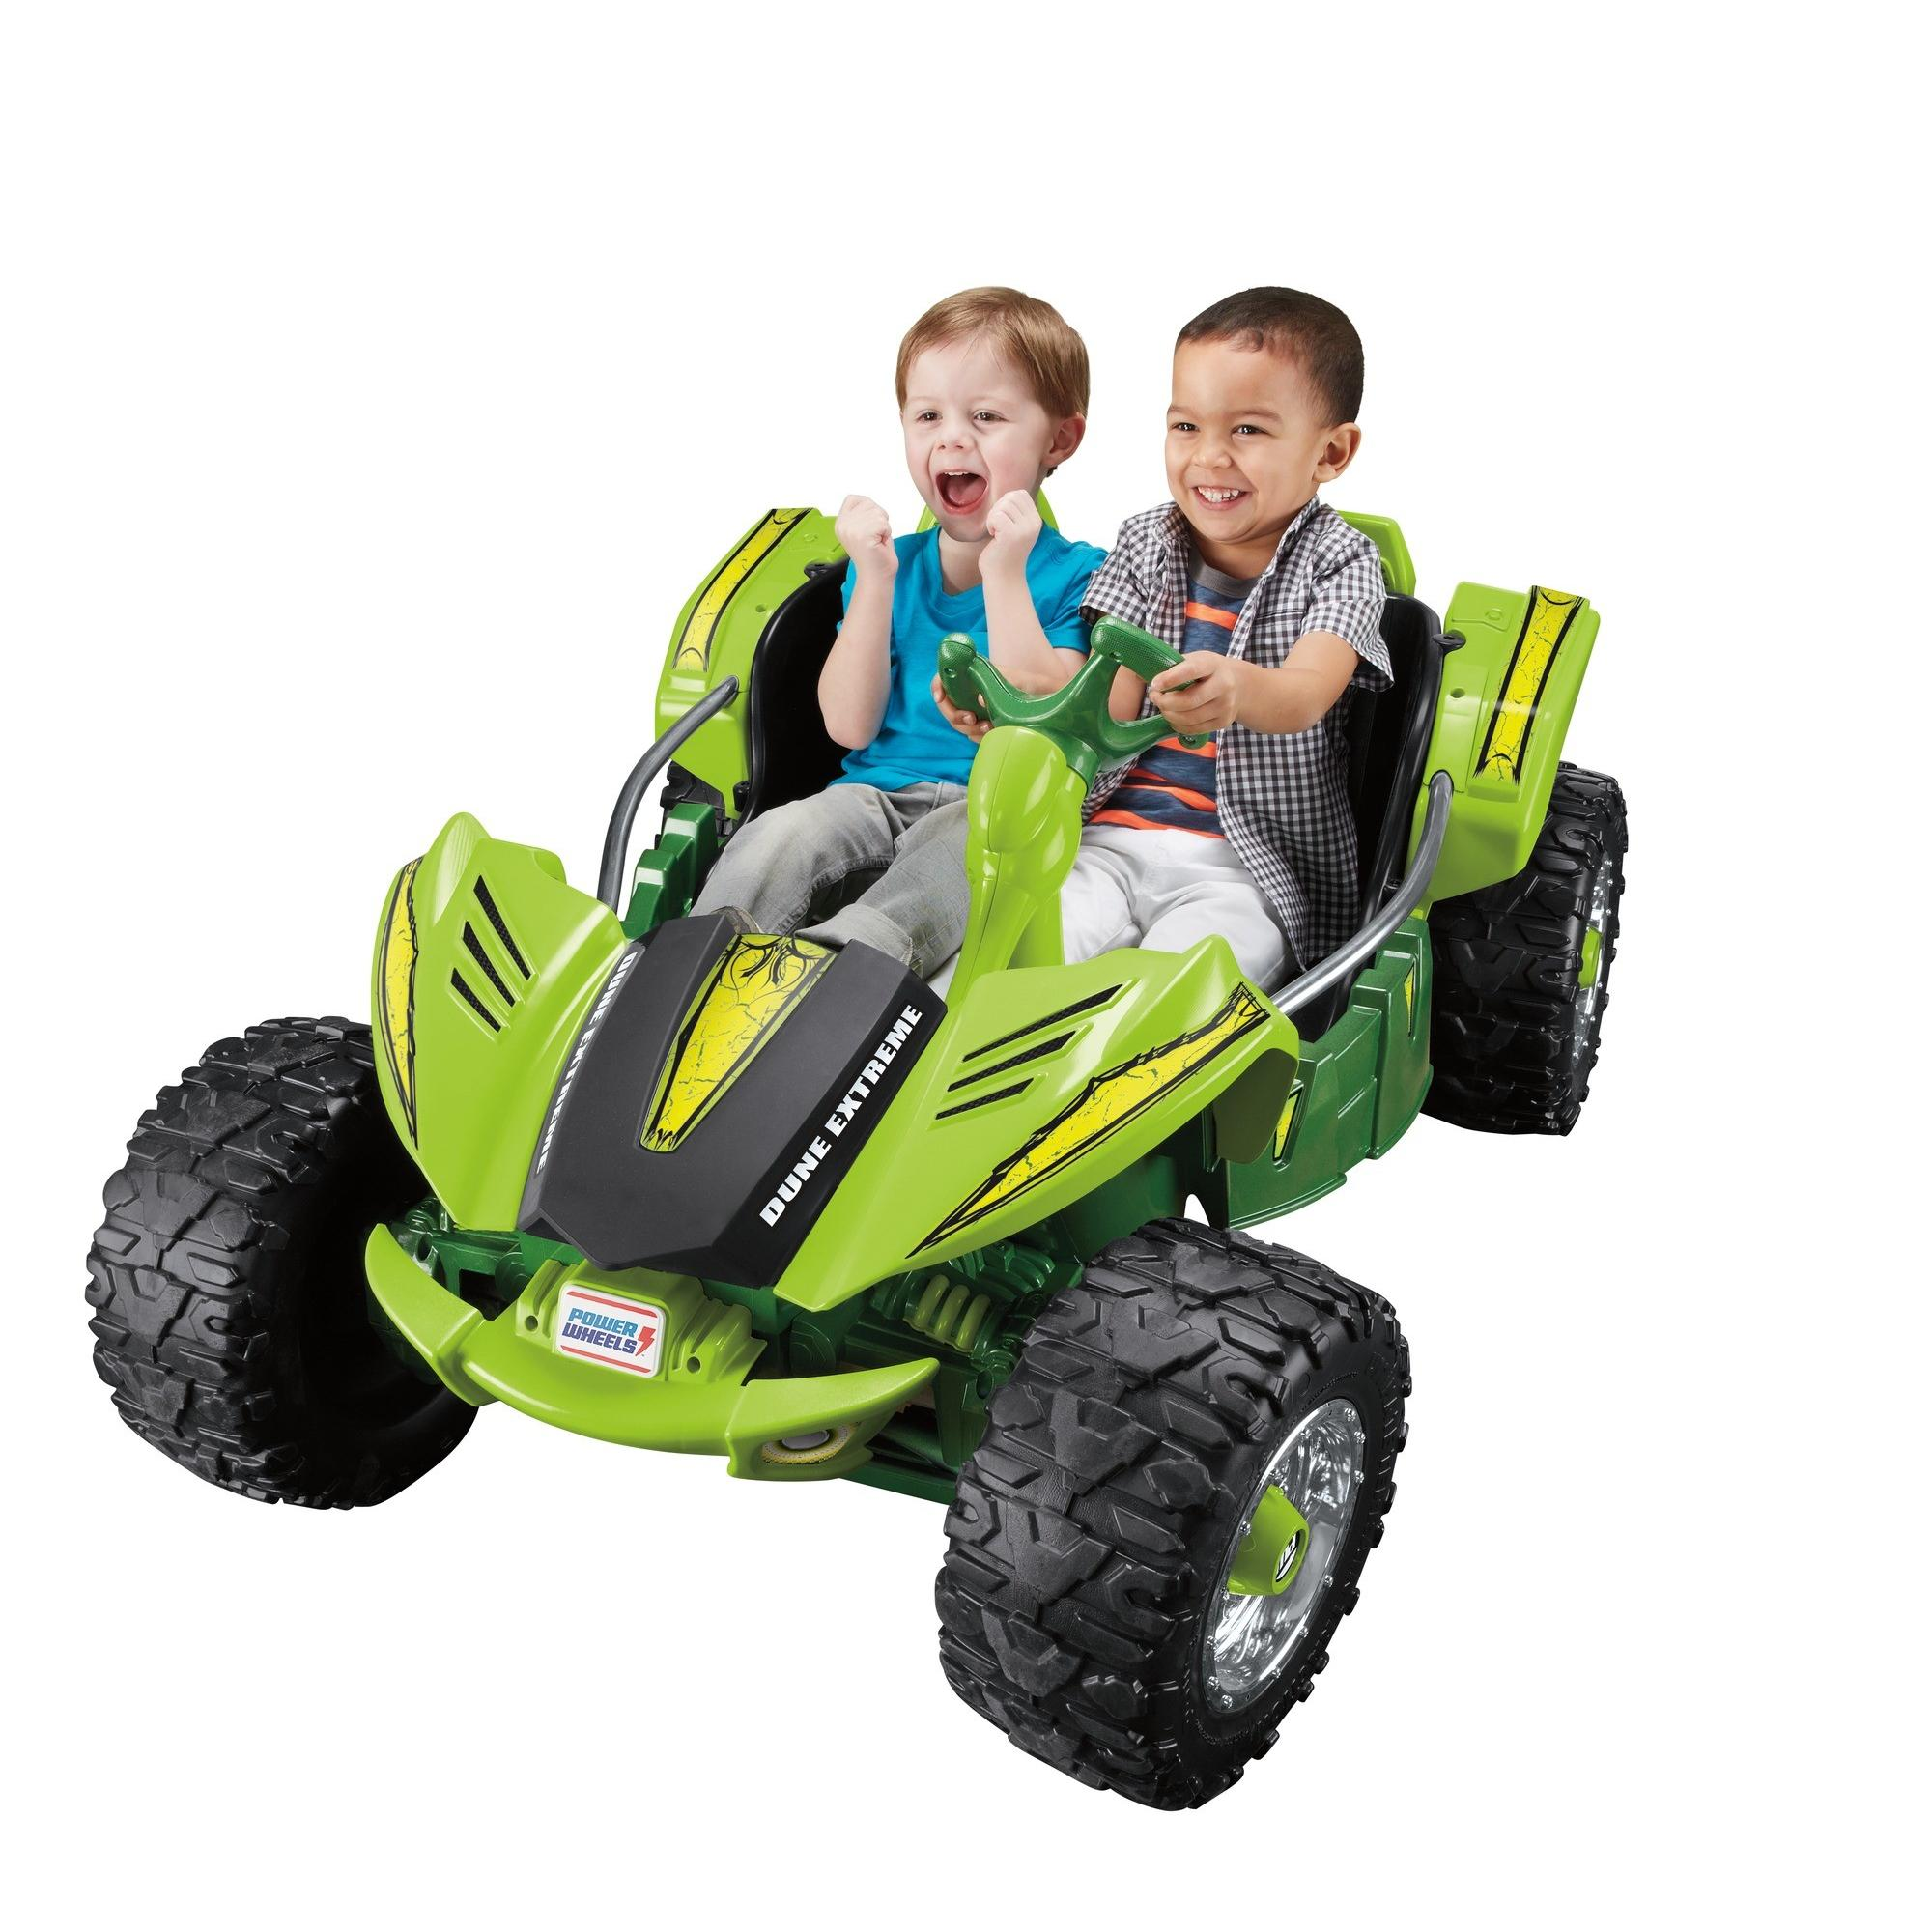 Power Wheels Dune Racer Extreme 12-V Battery-Powered Ride-On (Green)